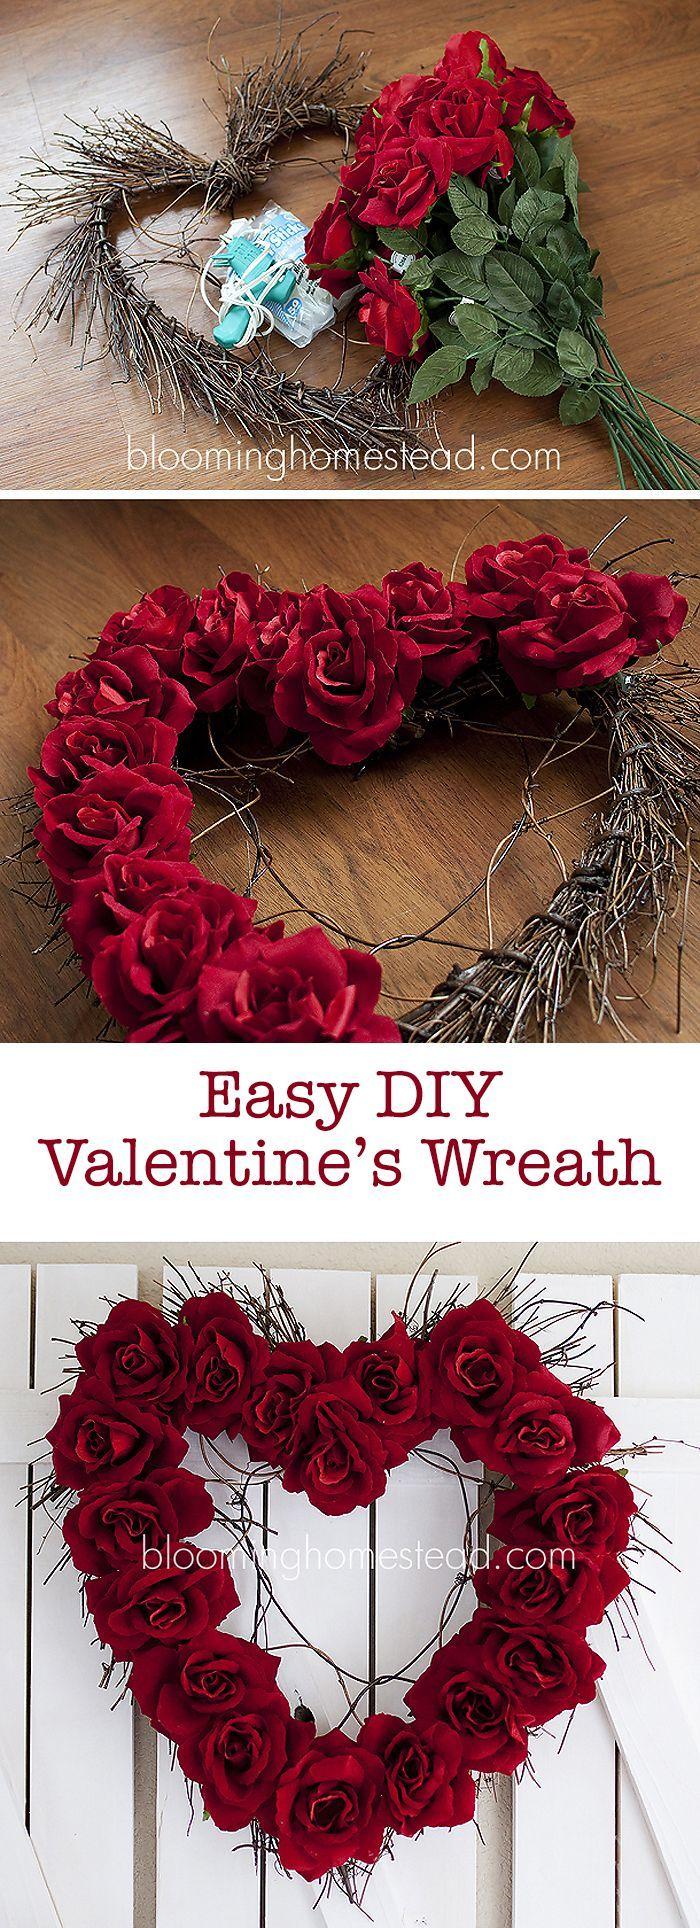 valentine wreath diy valentine 39 s day valentines diy valentine wreath valentine day wreaths. Black Bedroom Furniture Sets. Home Design Ideas